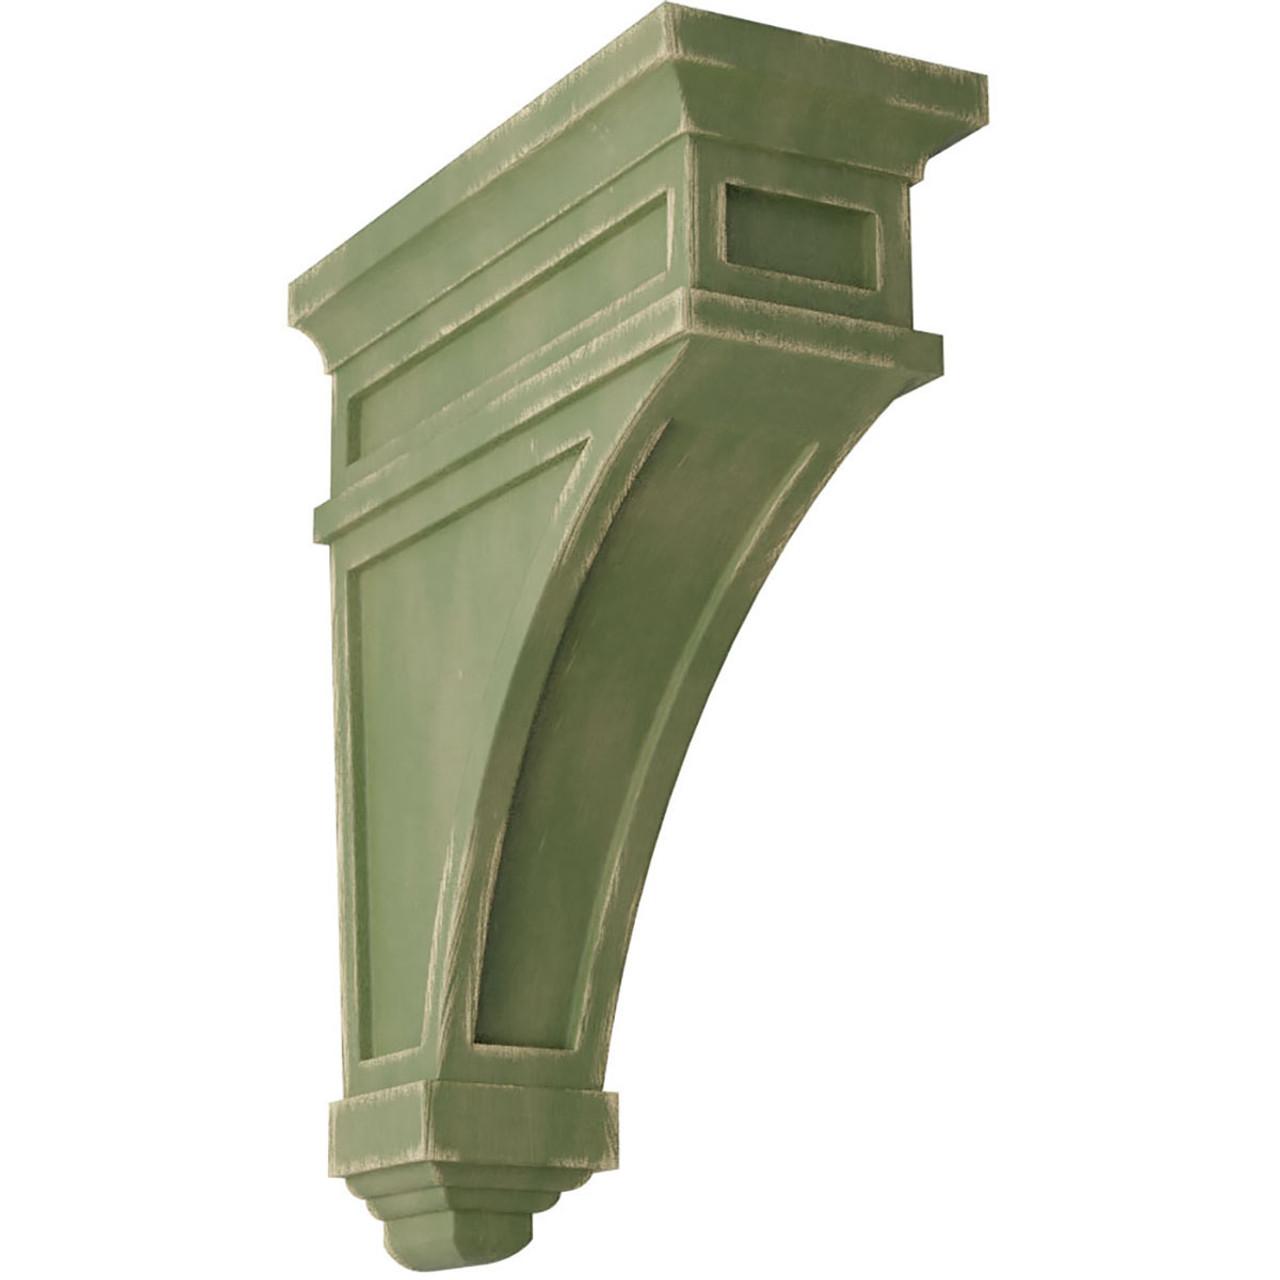 "4""W x 4""D x 12""H Arts and Crafts Wood Vintage Decor Corbel Vintage Green"